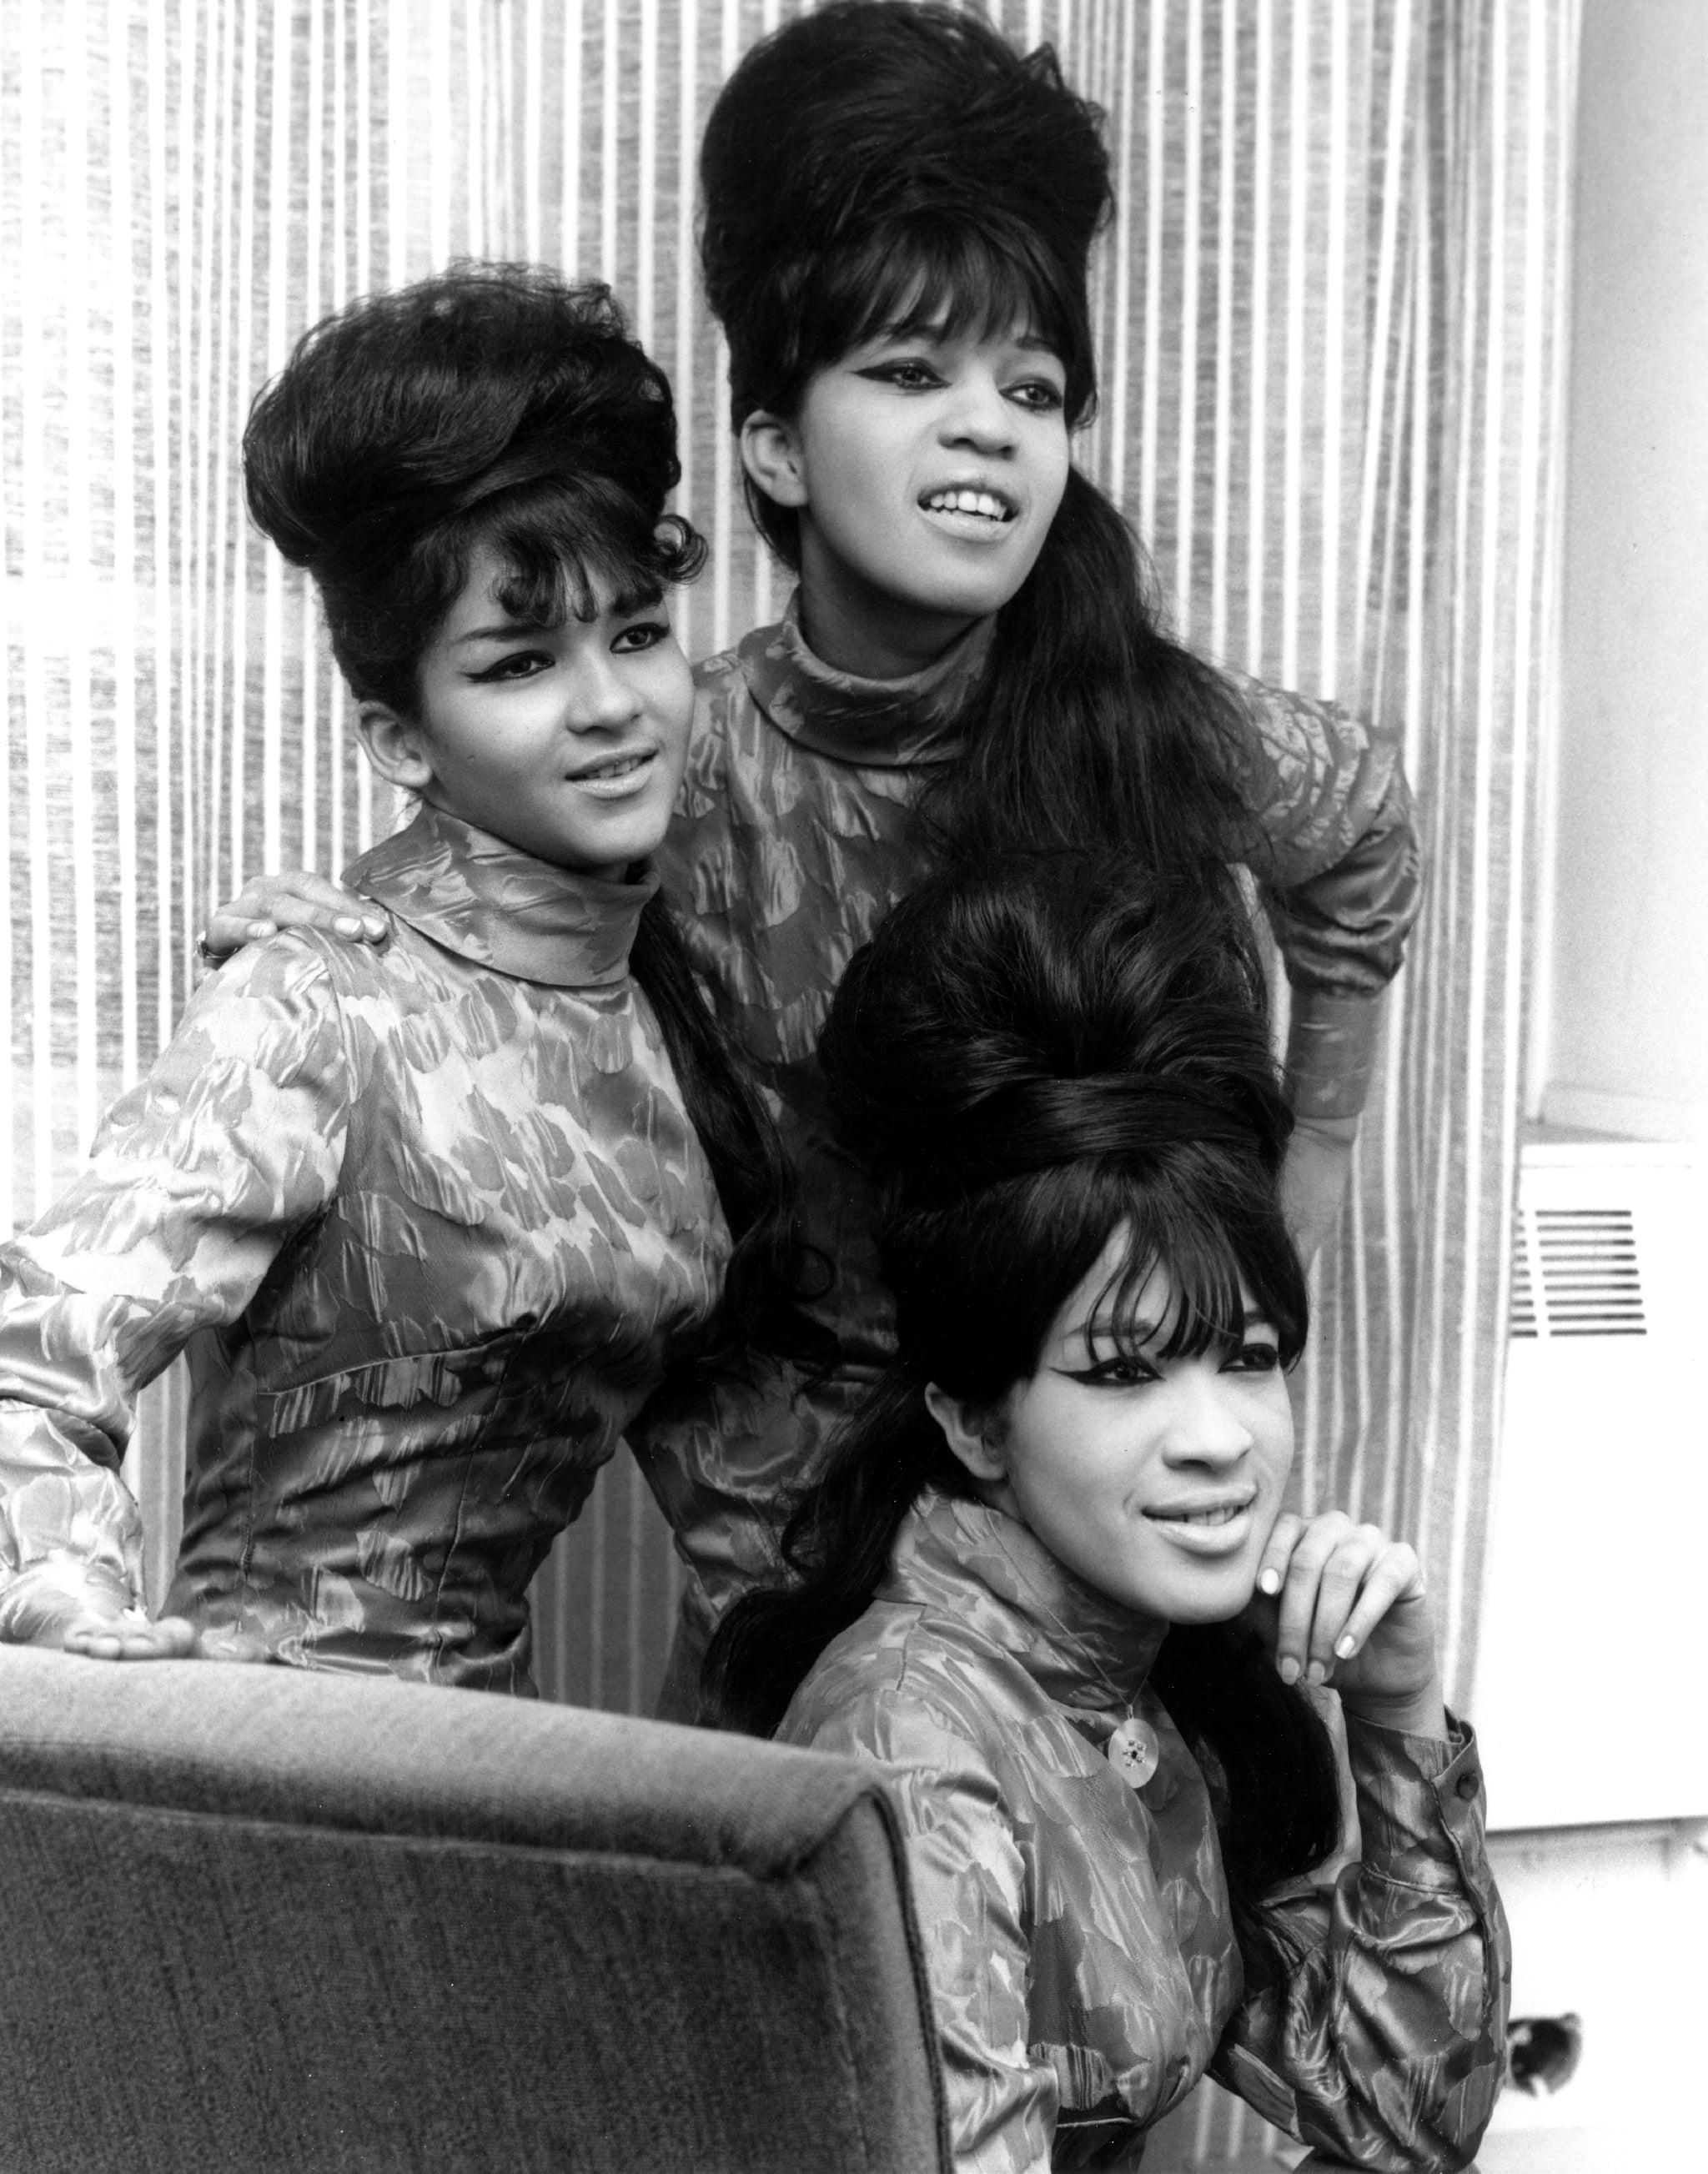 CIRCA 1965: ندرا تالی راس ، استل بنت وان ، و رونی اسپکتور از سه نفر آواز